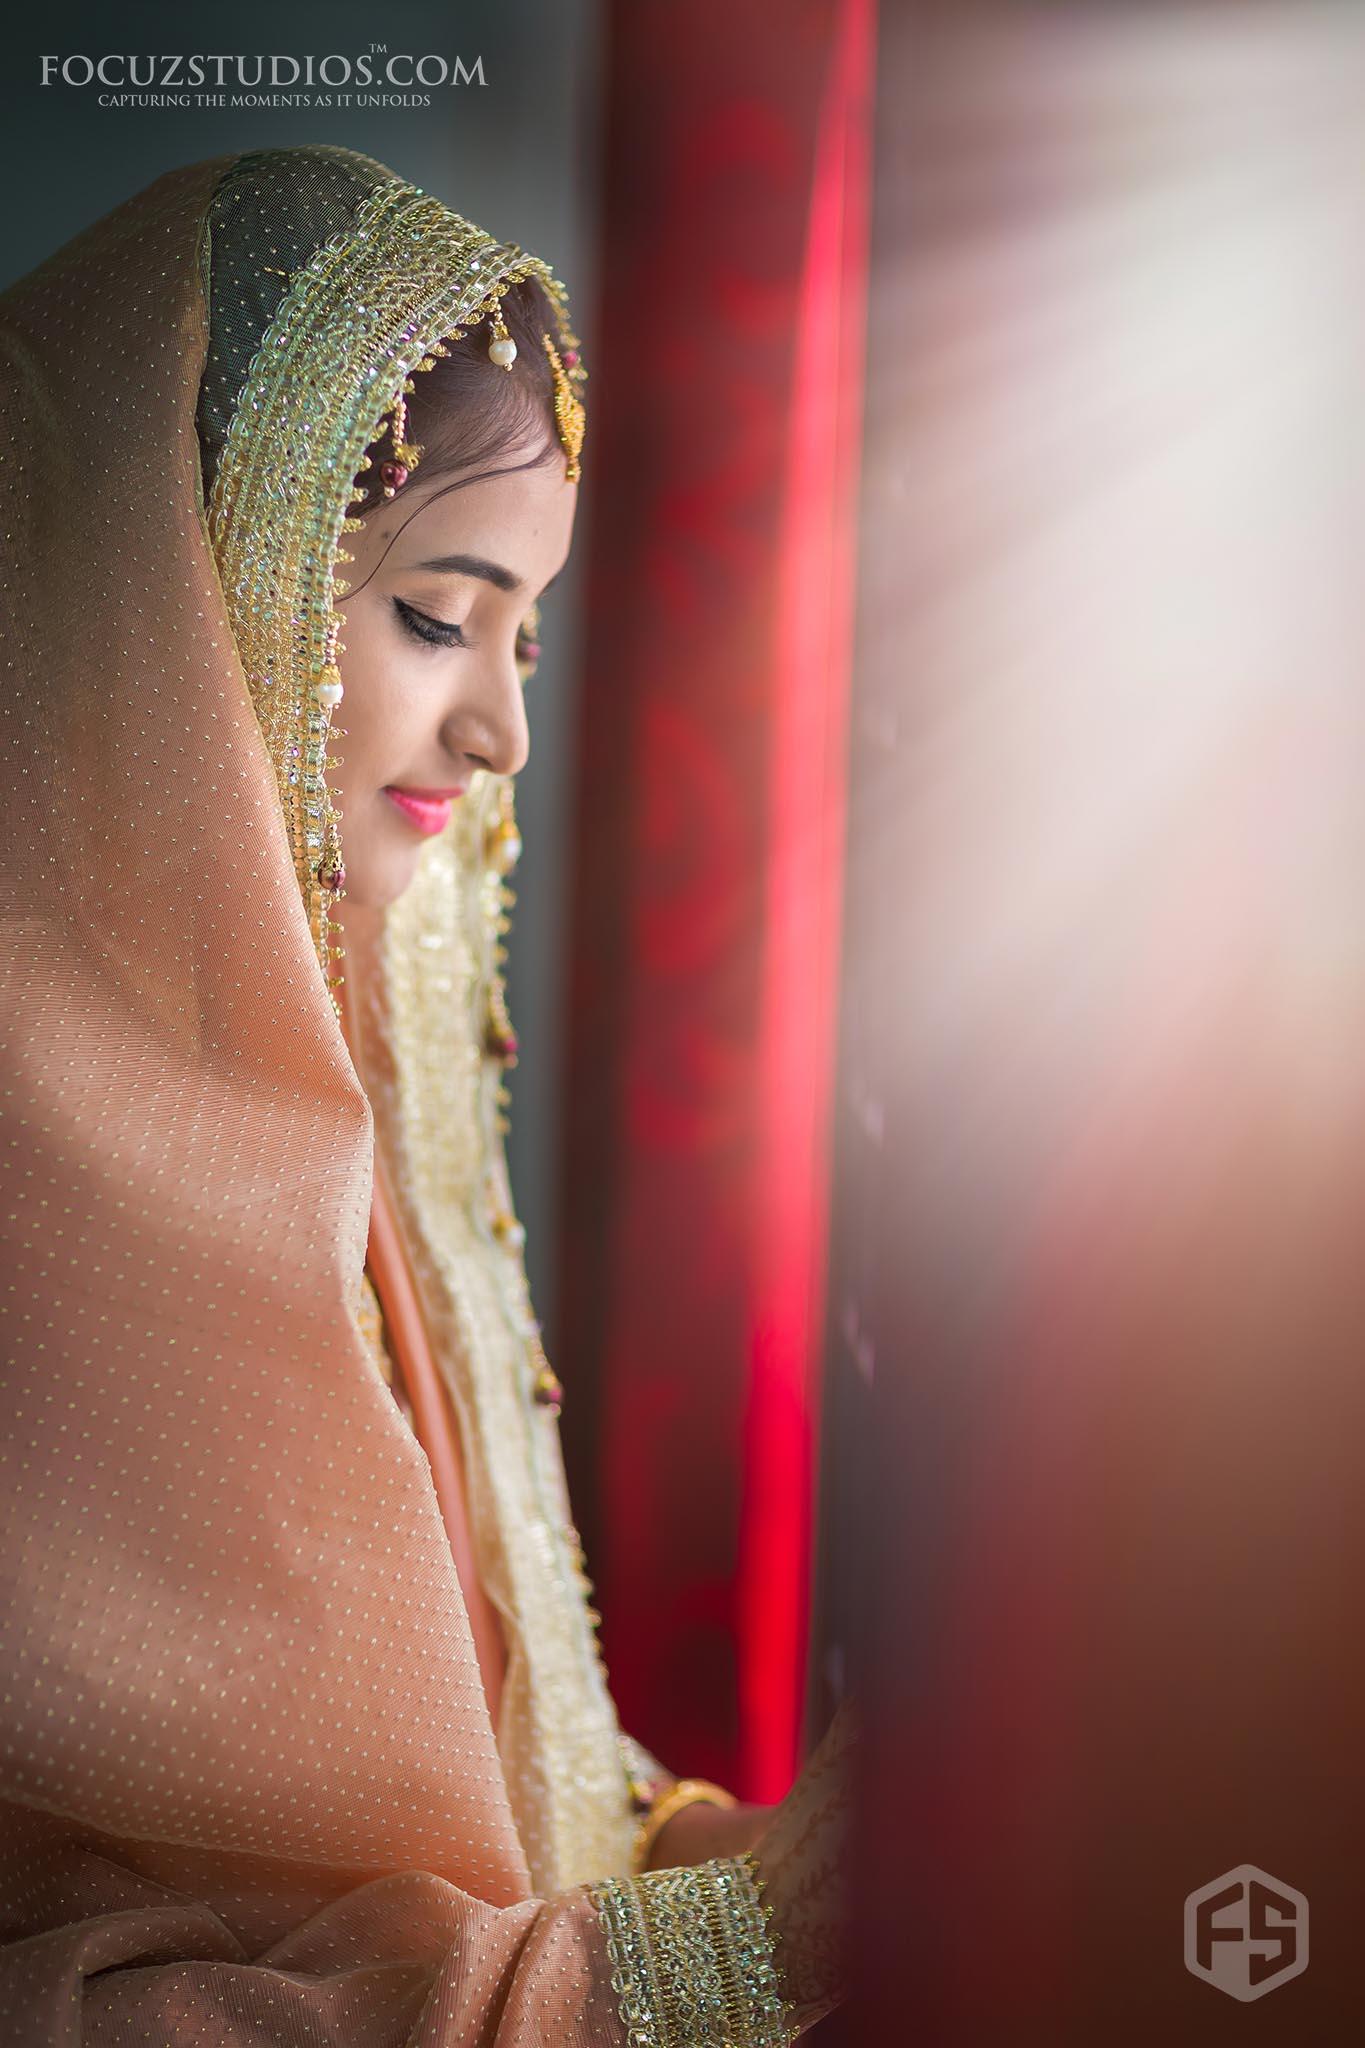 Muslim-wedding-photography-Best-Muslim-Nikah-photographers-in-India-10